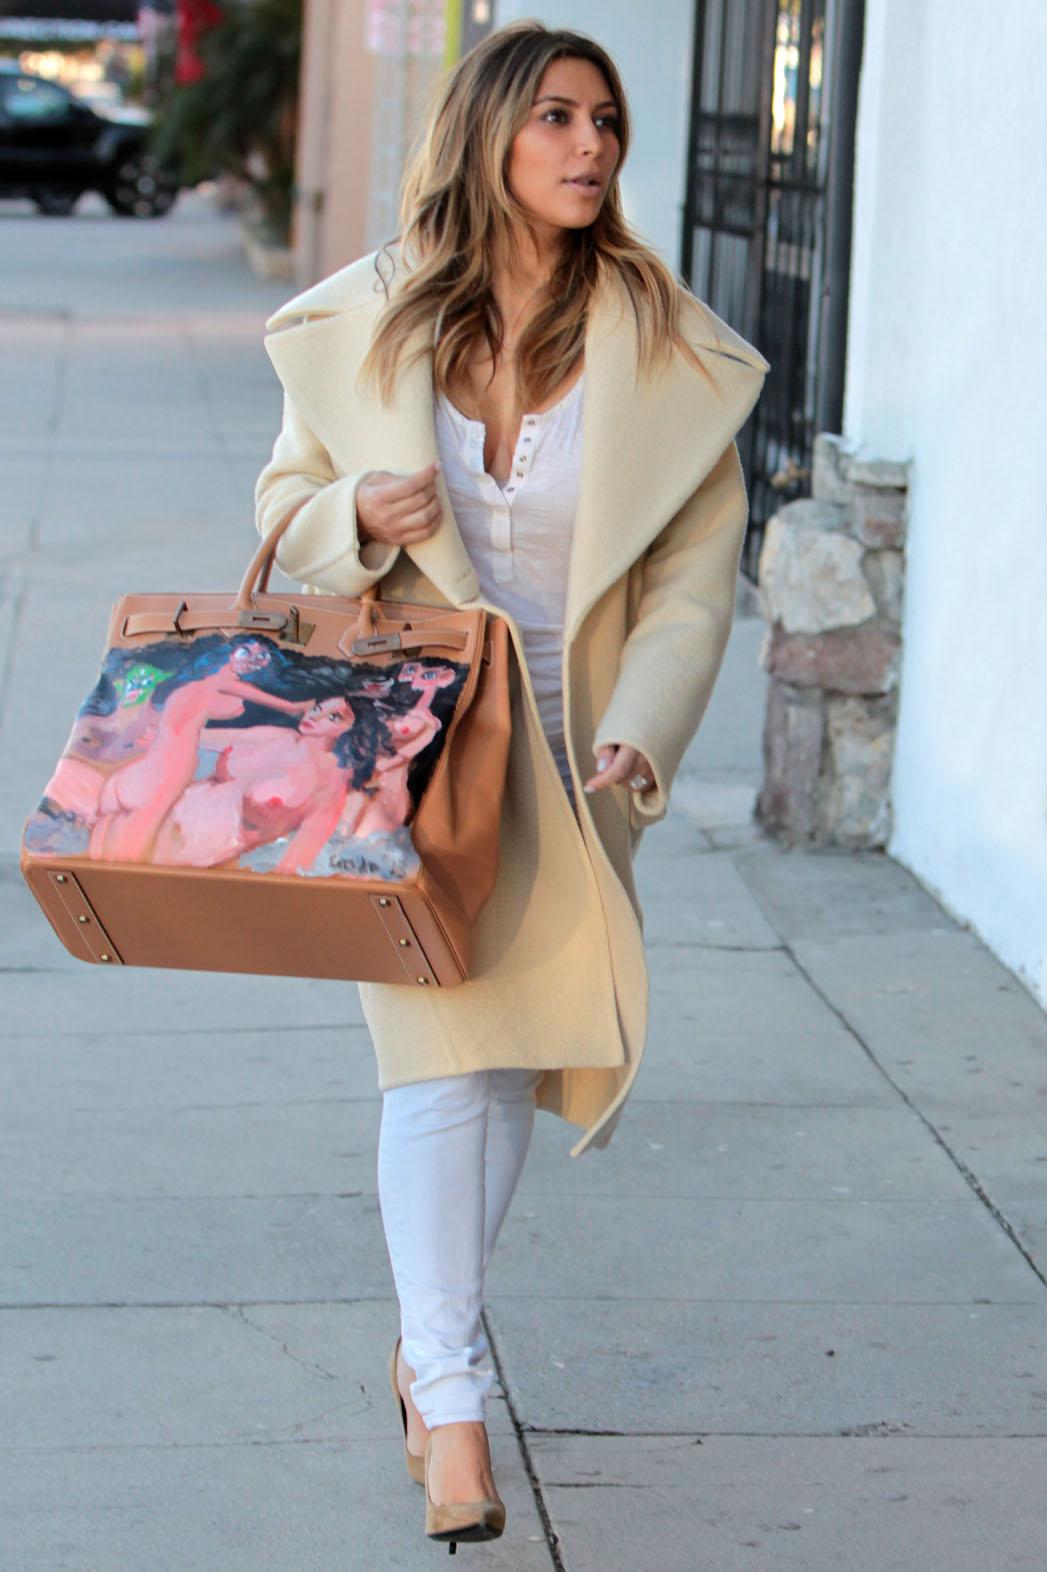 Kanye West gifts Kim Kardashian Hermes handbag featuring